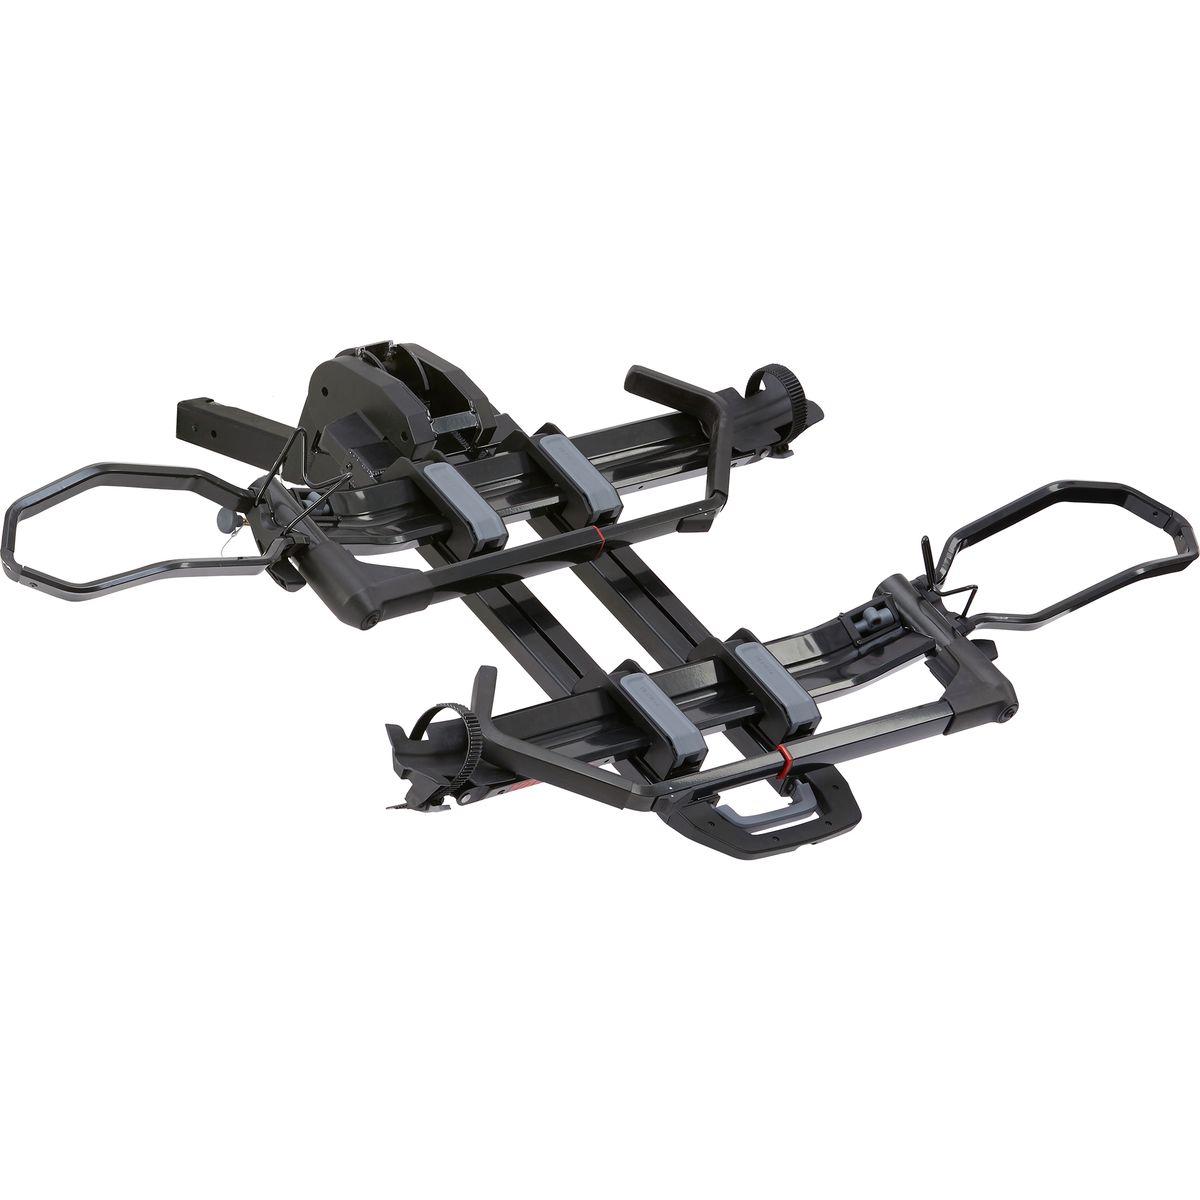 Yakima DrTray Bike Rack